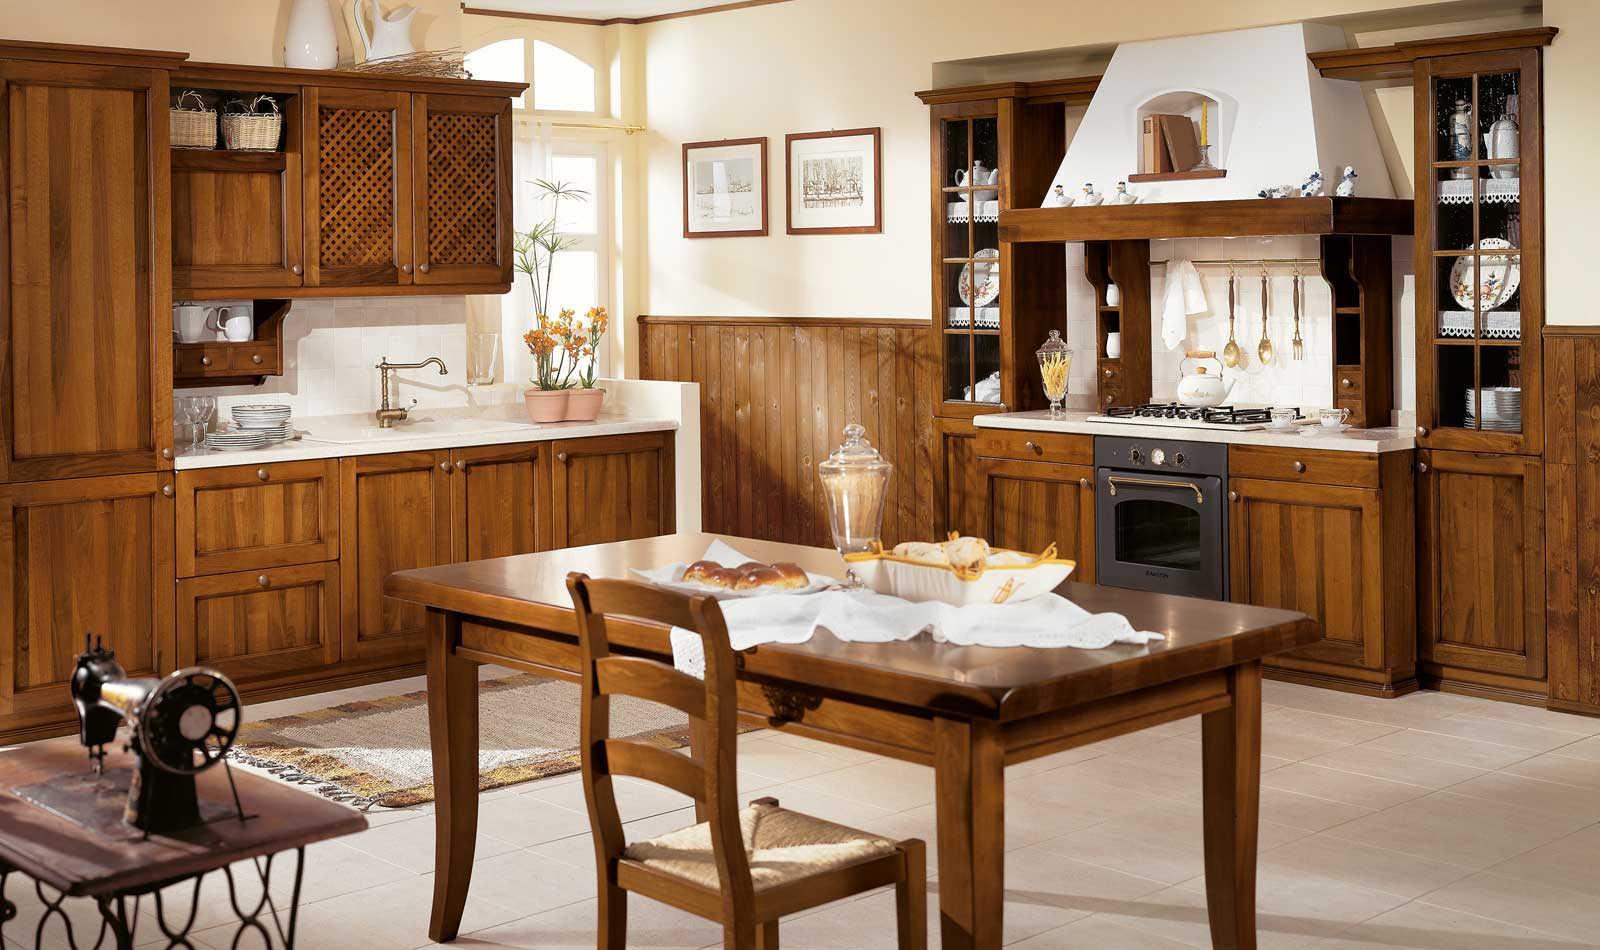 Lucrezia - cucina classica - Negozio arredamento Venezia